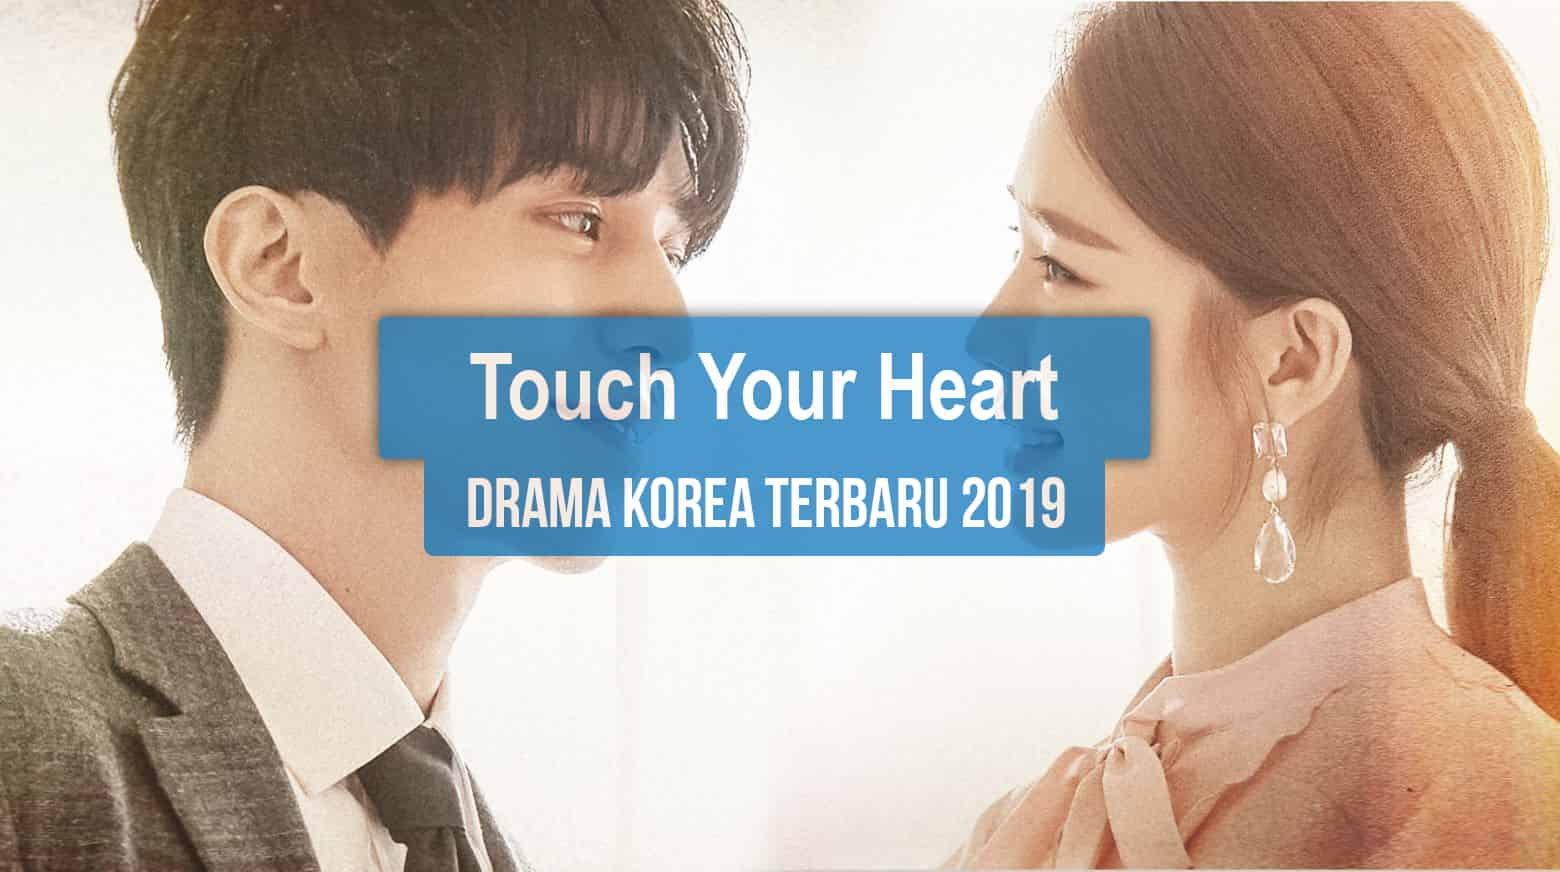 Sinopsis Tanggal Rilis Jadwal Drama Korea Touch Your Heart Bahasa Indonesia